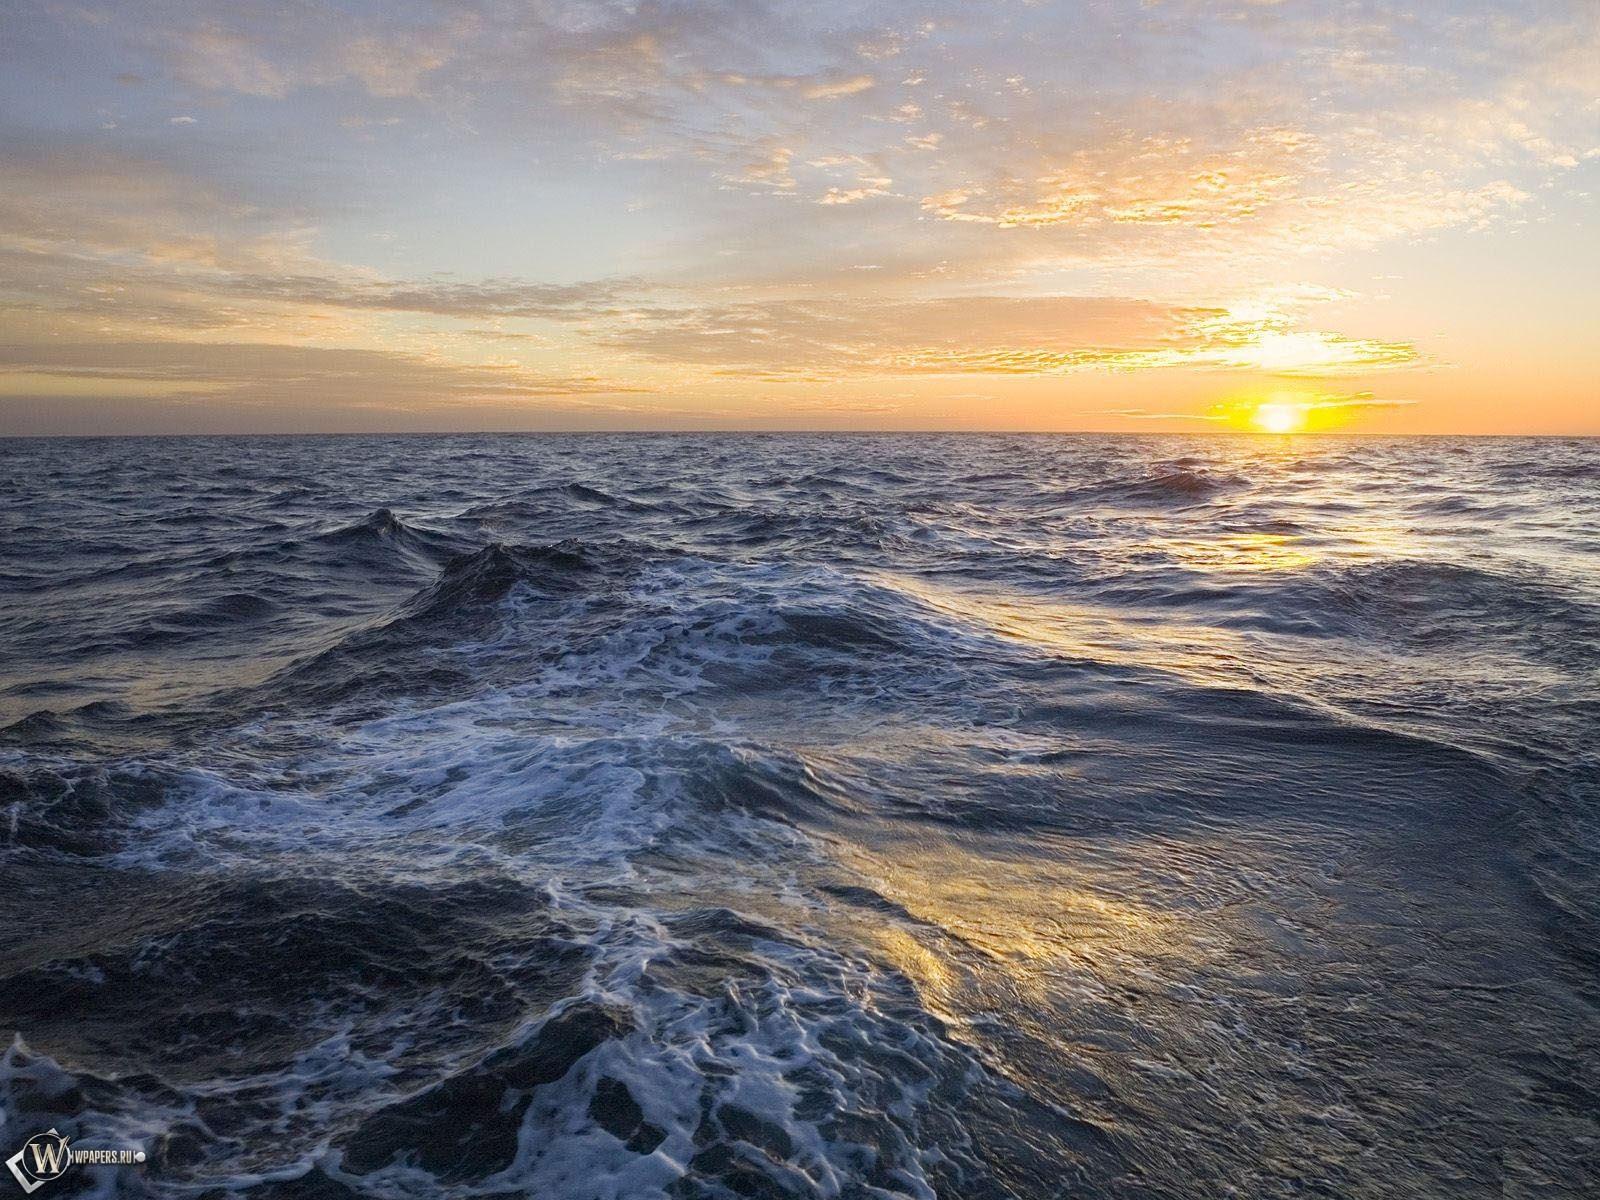 Восход на море 1600x1200